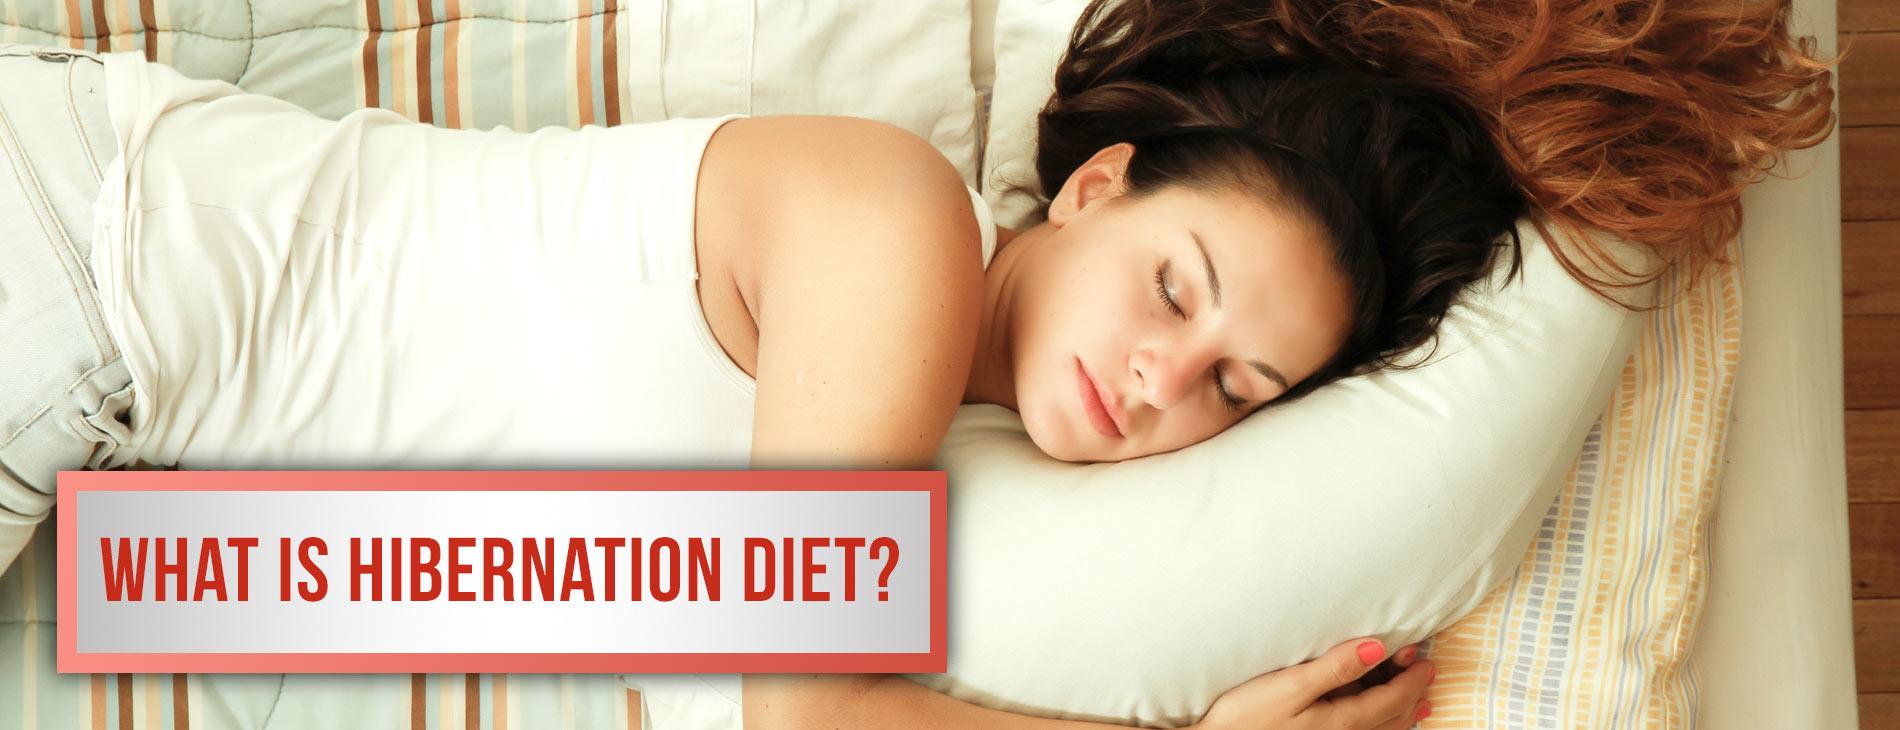 What Is Hibernation Diet